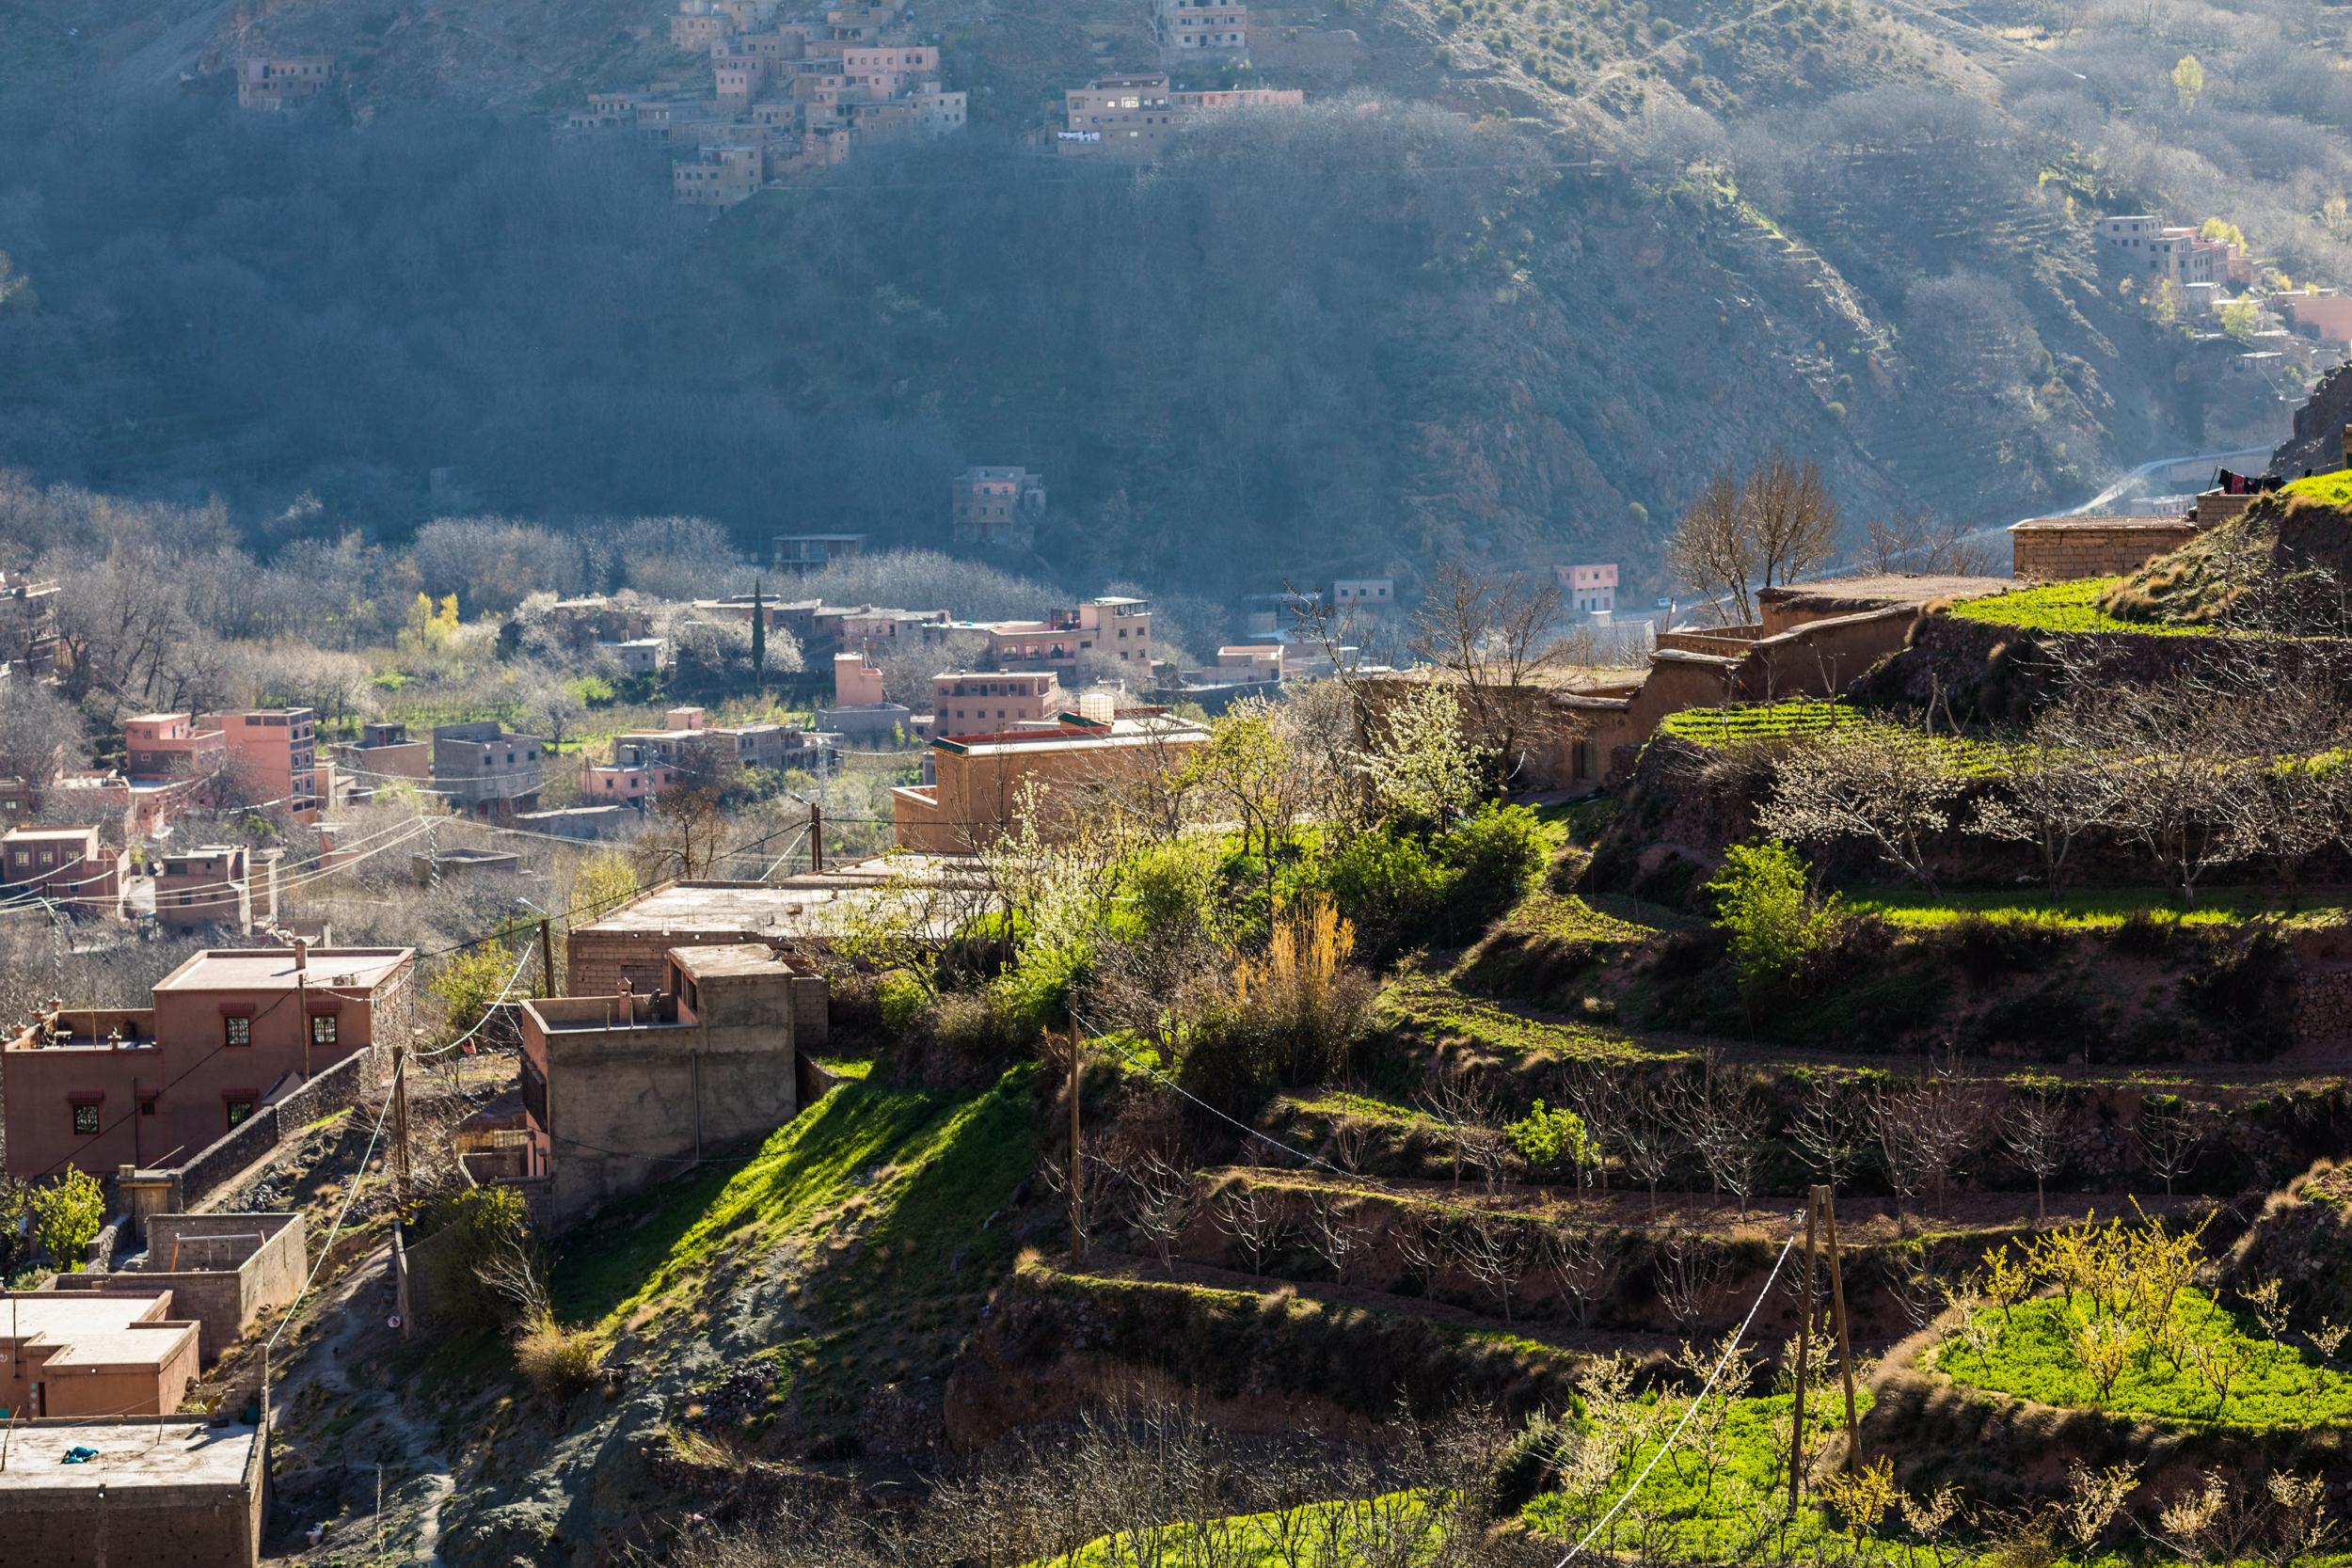 Colin_Herrington_Maroc_Stories-36.jpg